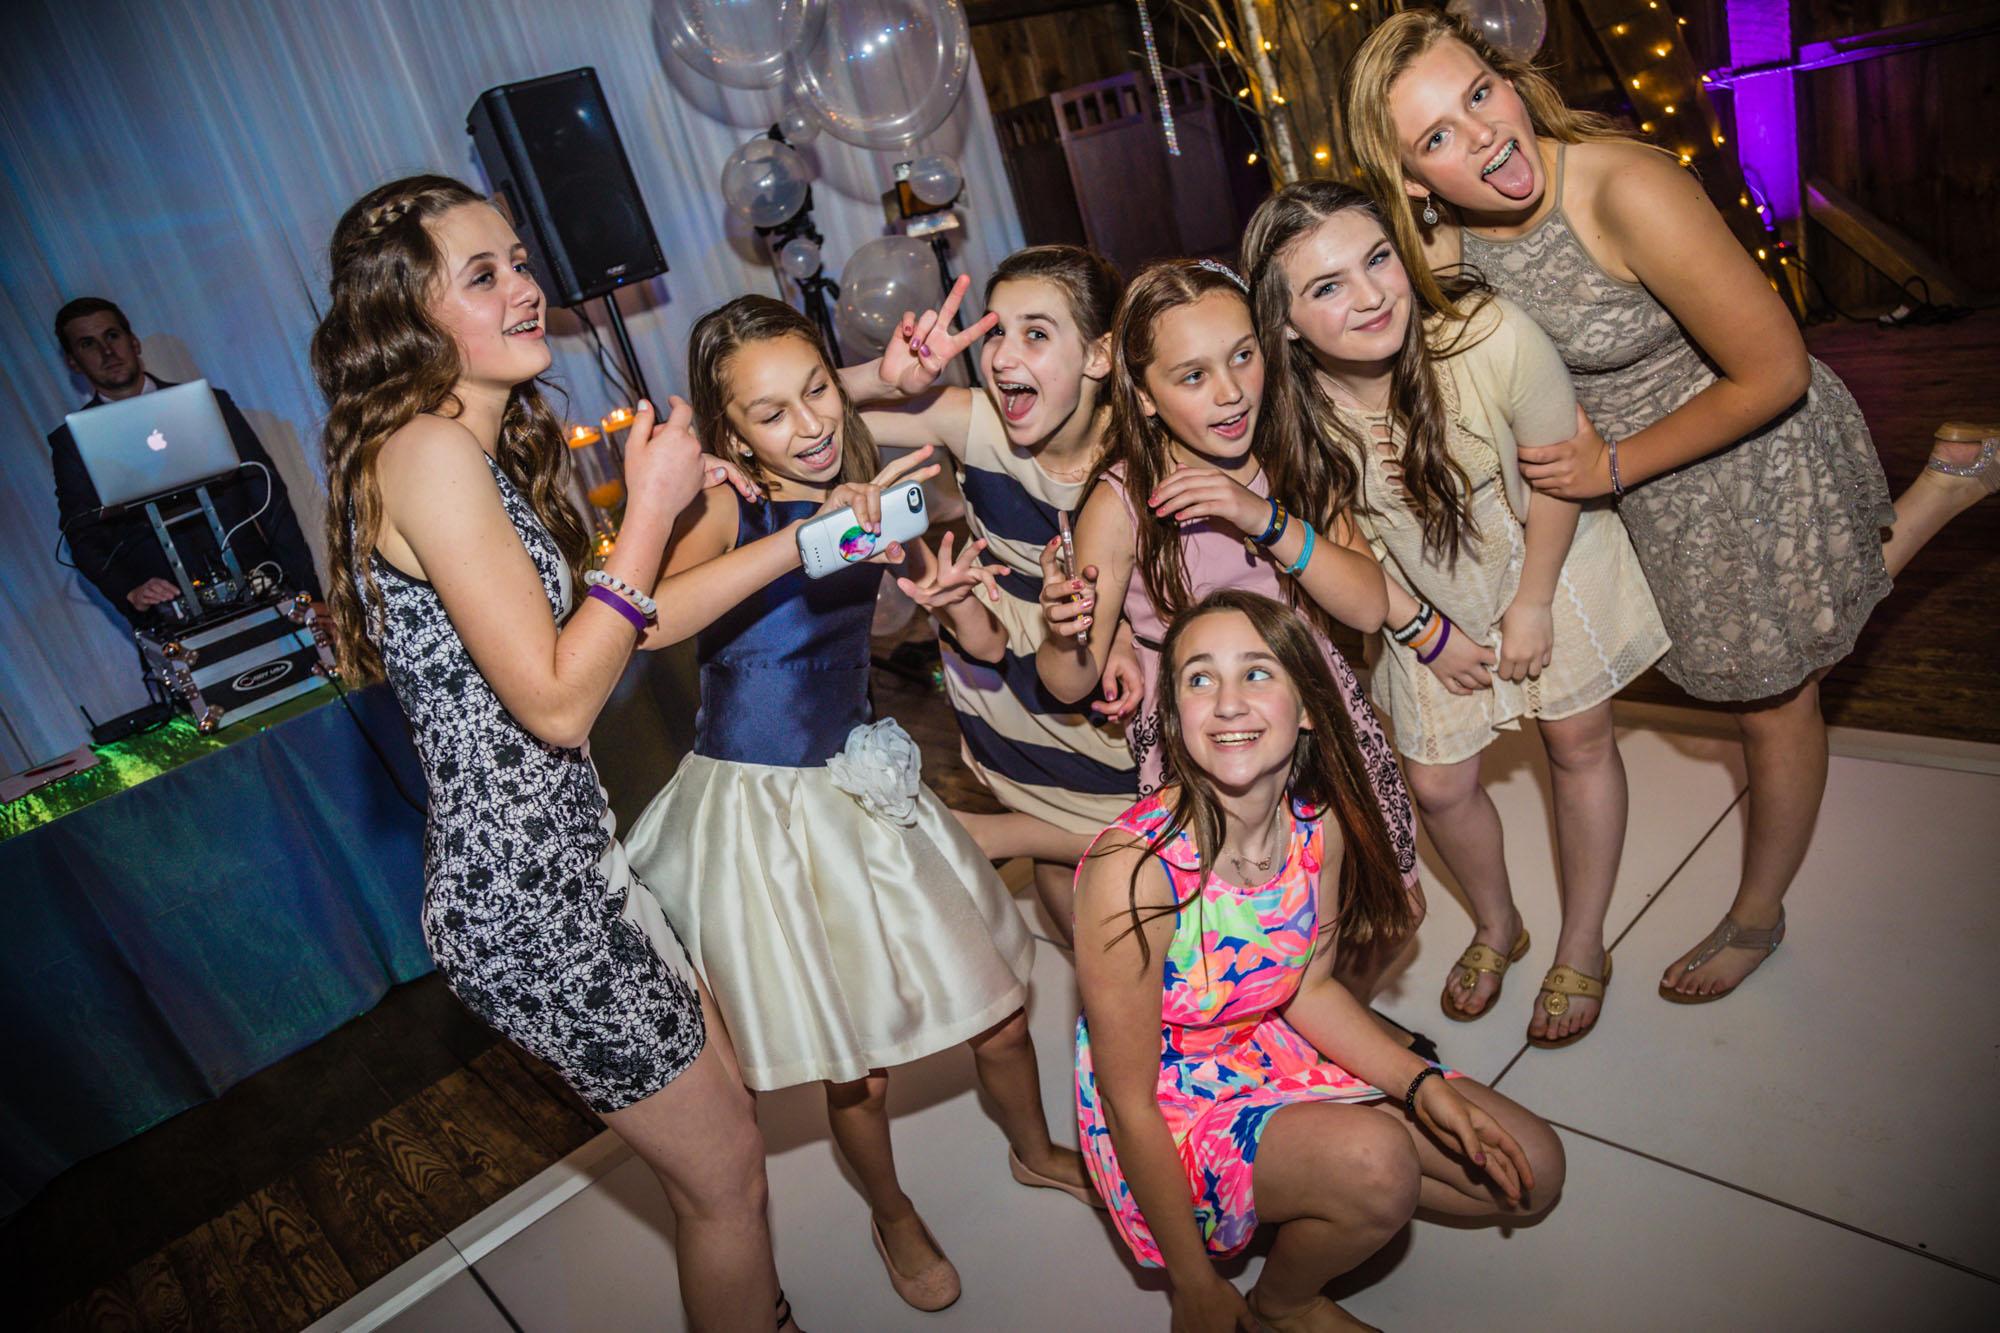 scranton_wedding_photographer_lettieri_pa (8 of 27).jpg